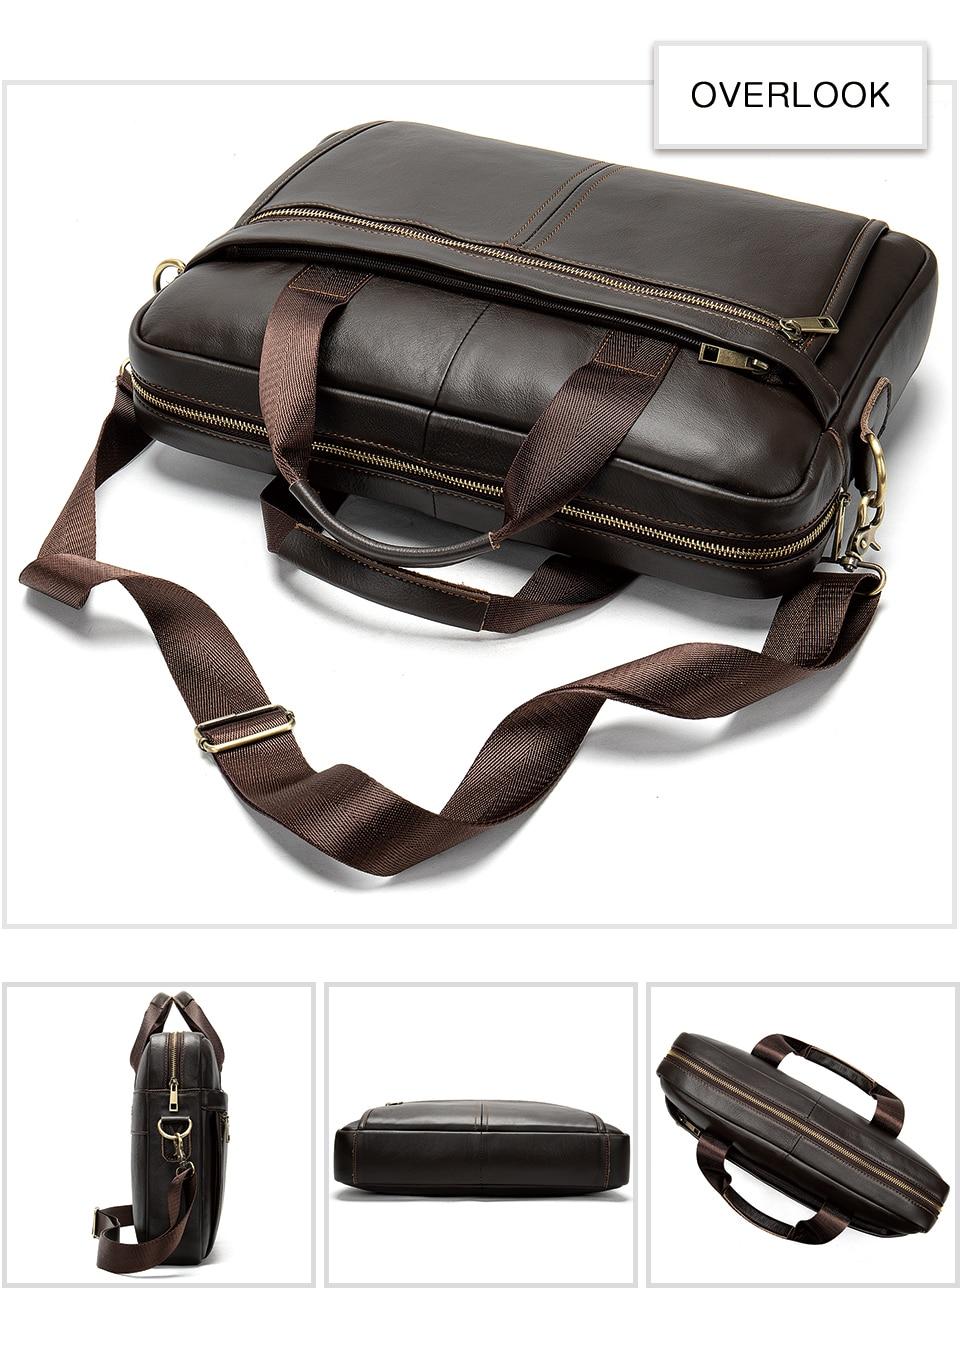 Torba za torbe muška torba muška od prave kože 14 '' torba za - Aktovke - Foto 6